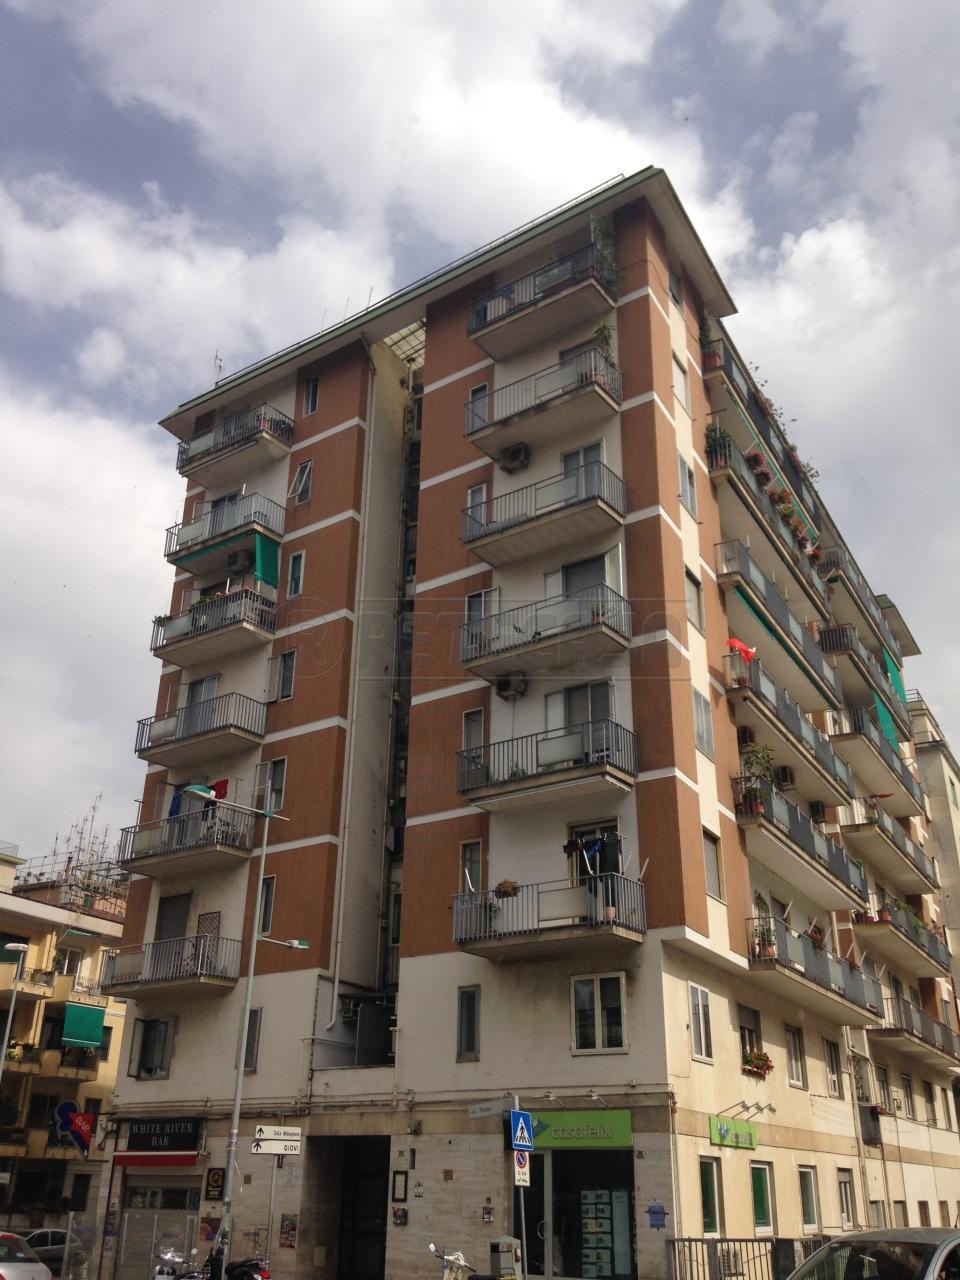 Bilocale Salerno Via Nizza 212 2